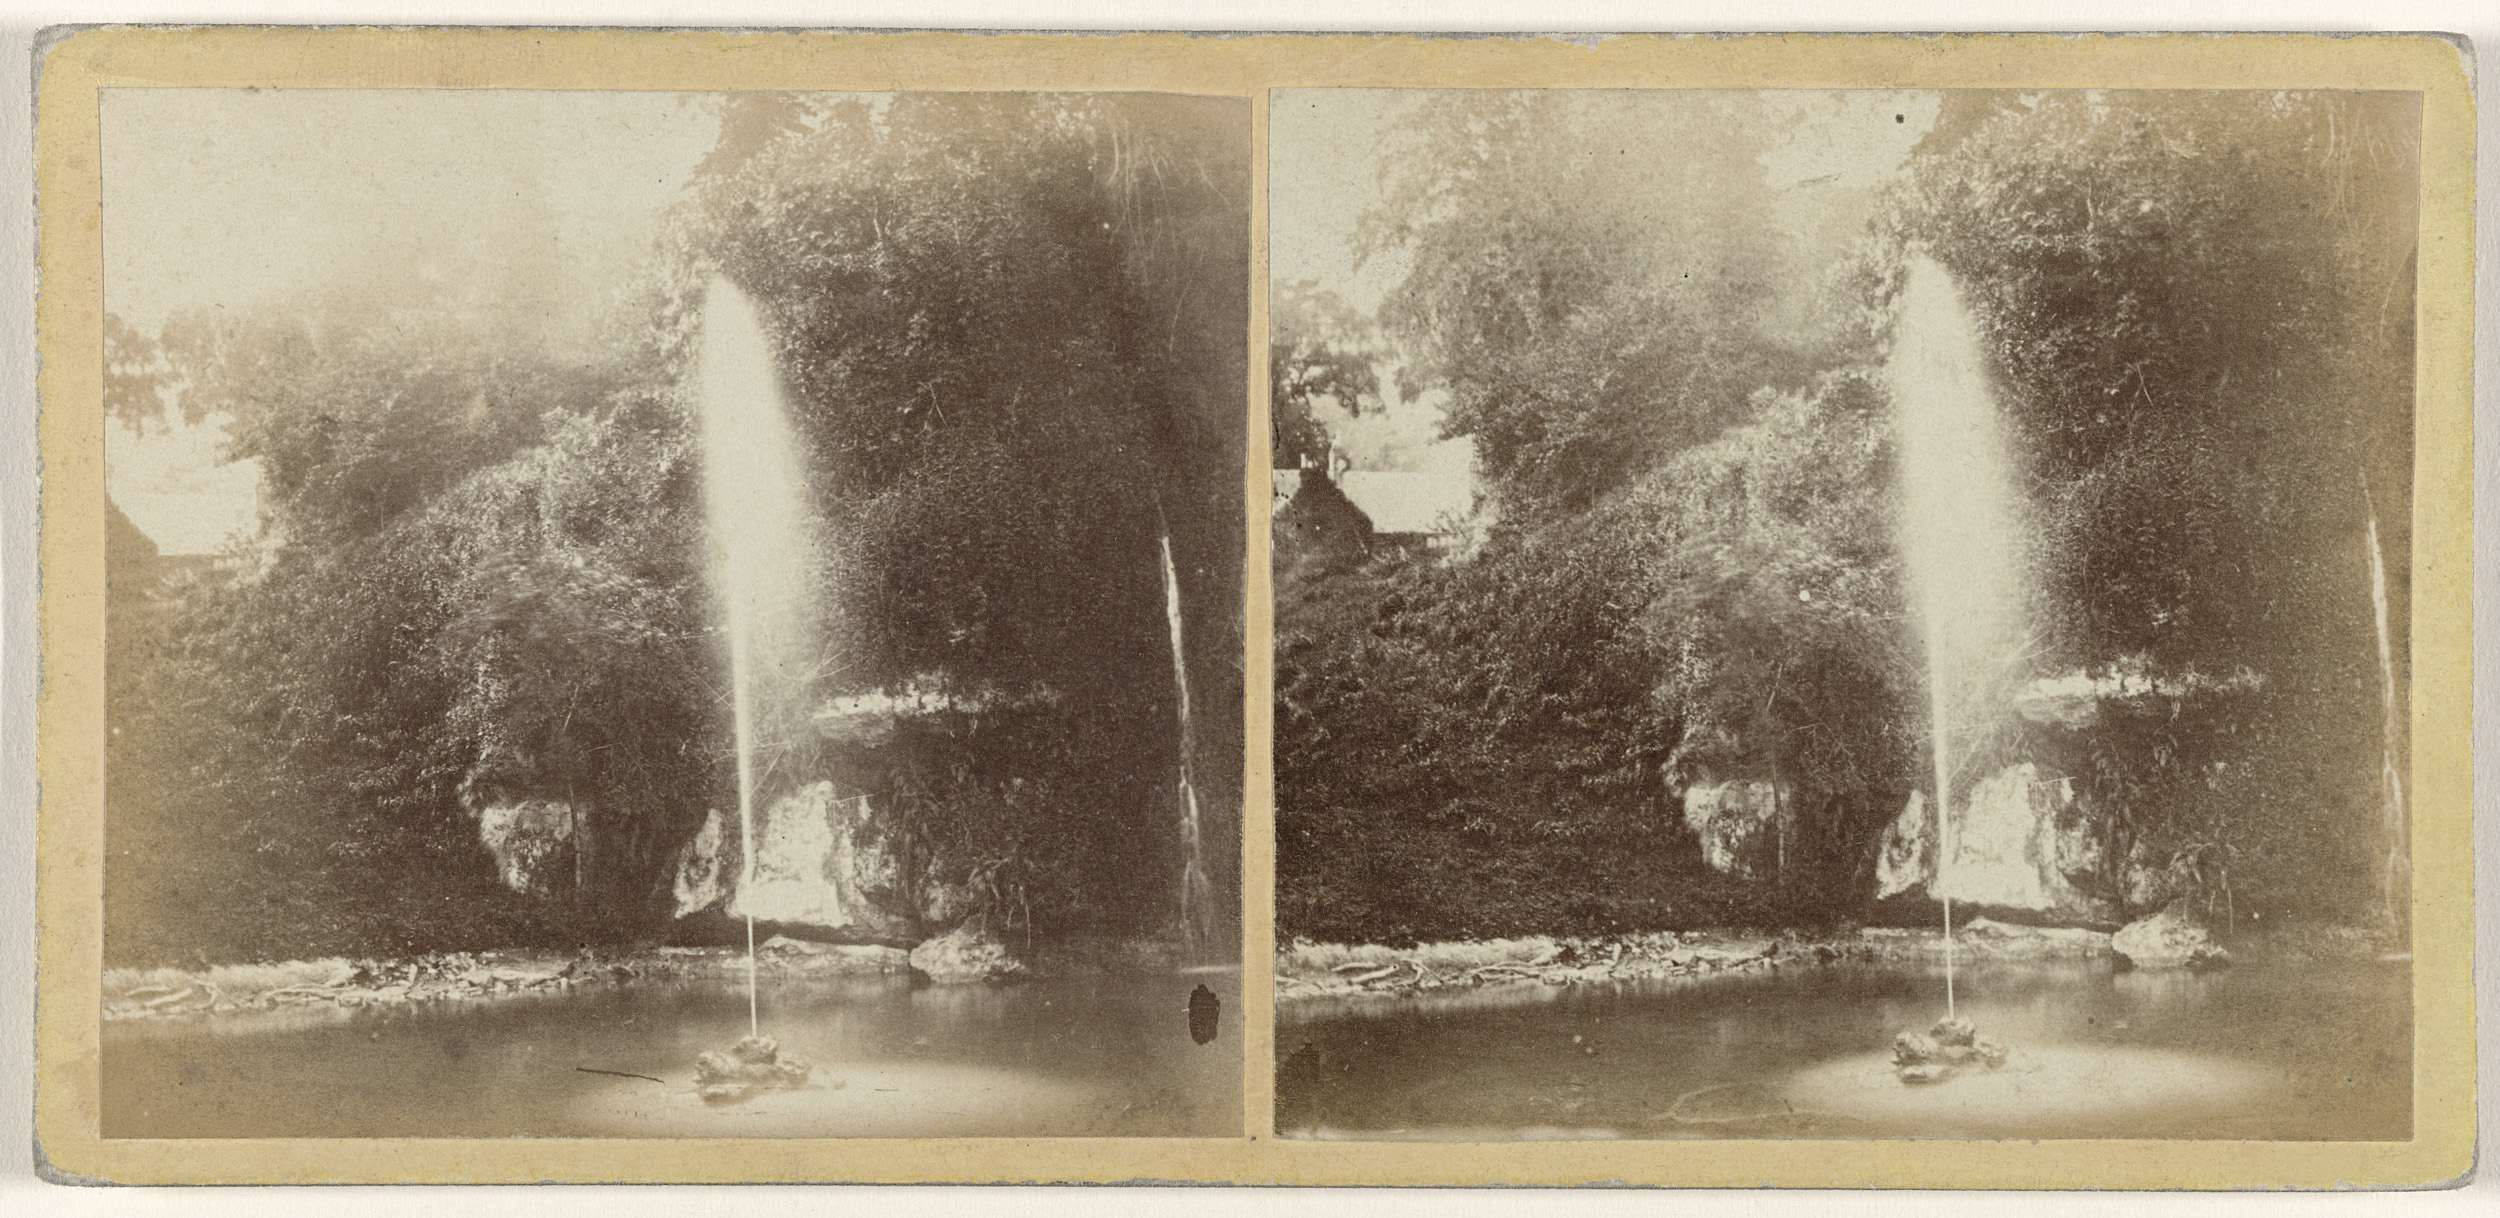 Isaac Hollis | Foumtain at Pulpit Rock, Isle of Wight, Isaac Hollis, 1861 |